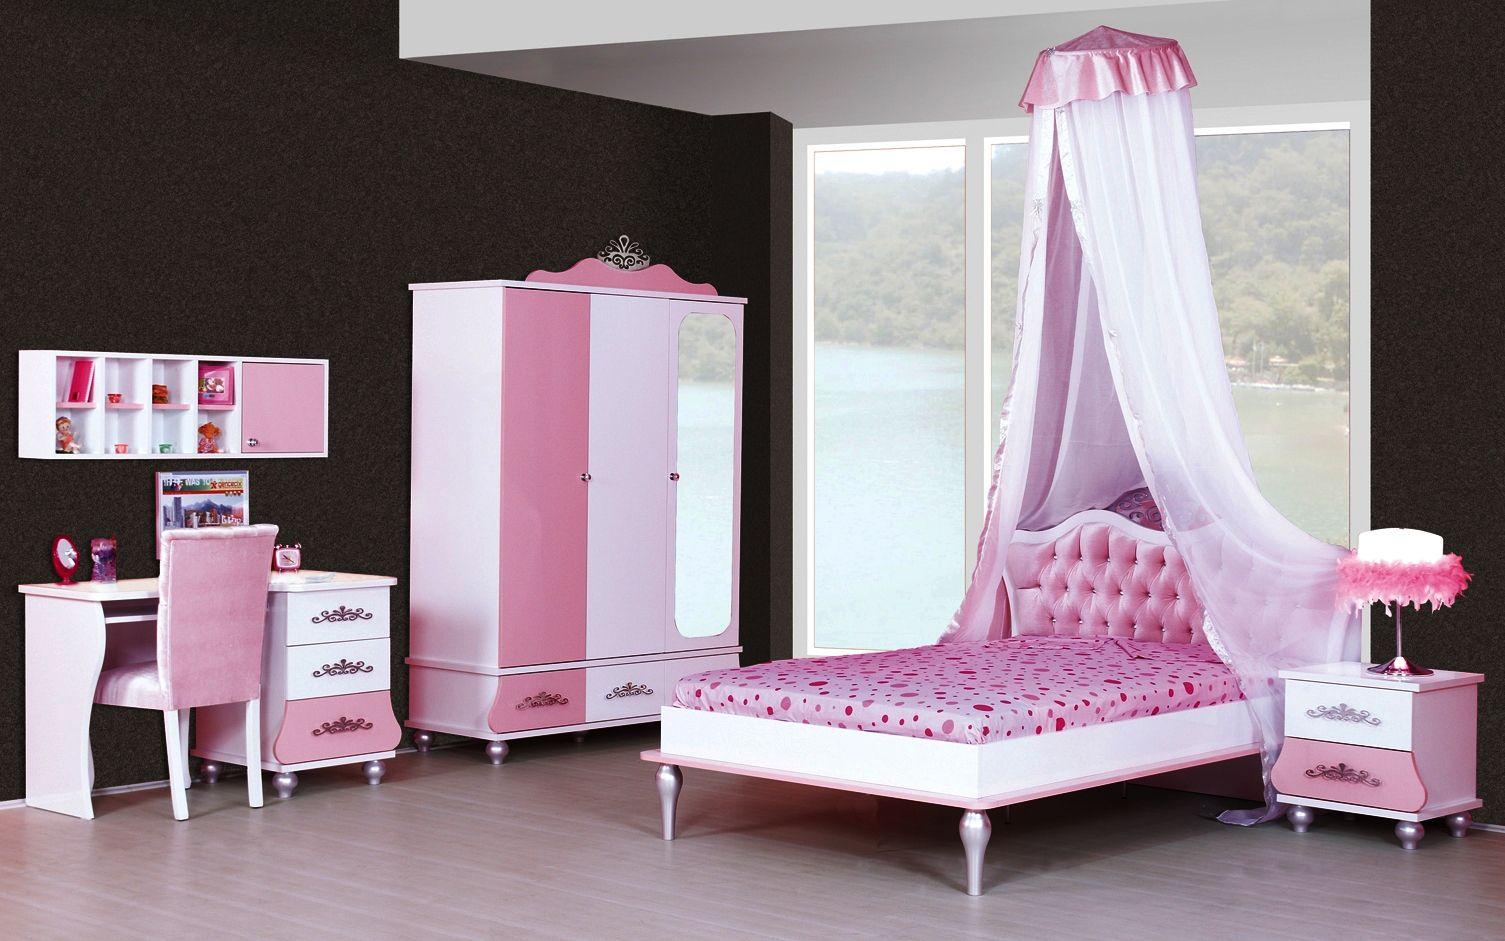 Prinses Kinderkamer Set : Meisjeskamer prinses kinderkamer prinsessenkamer romantische